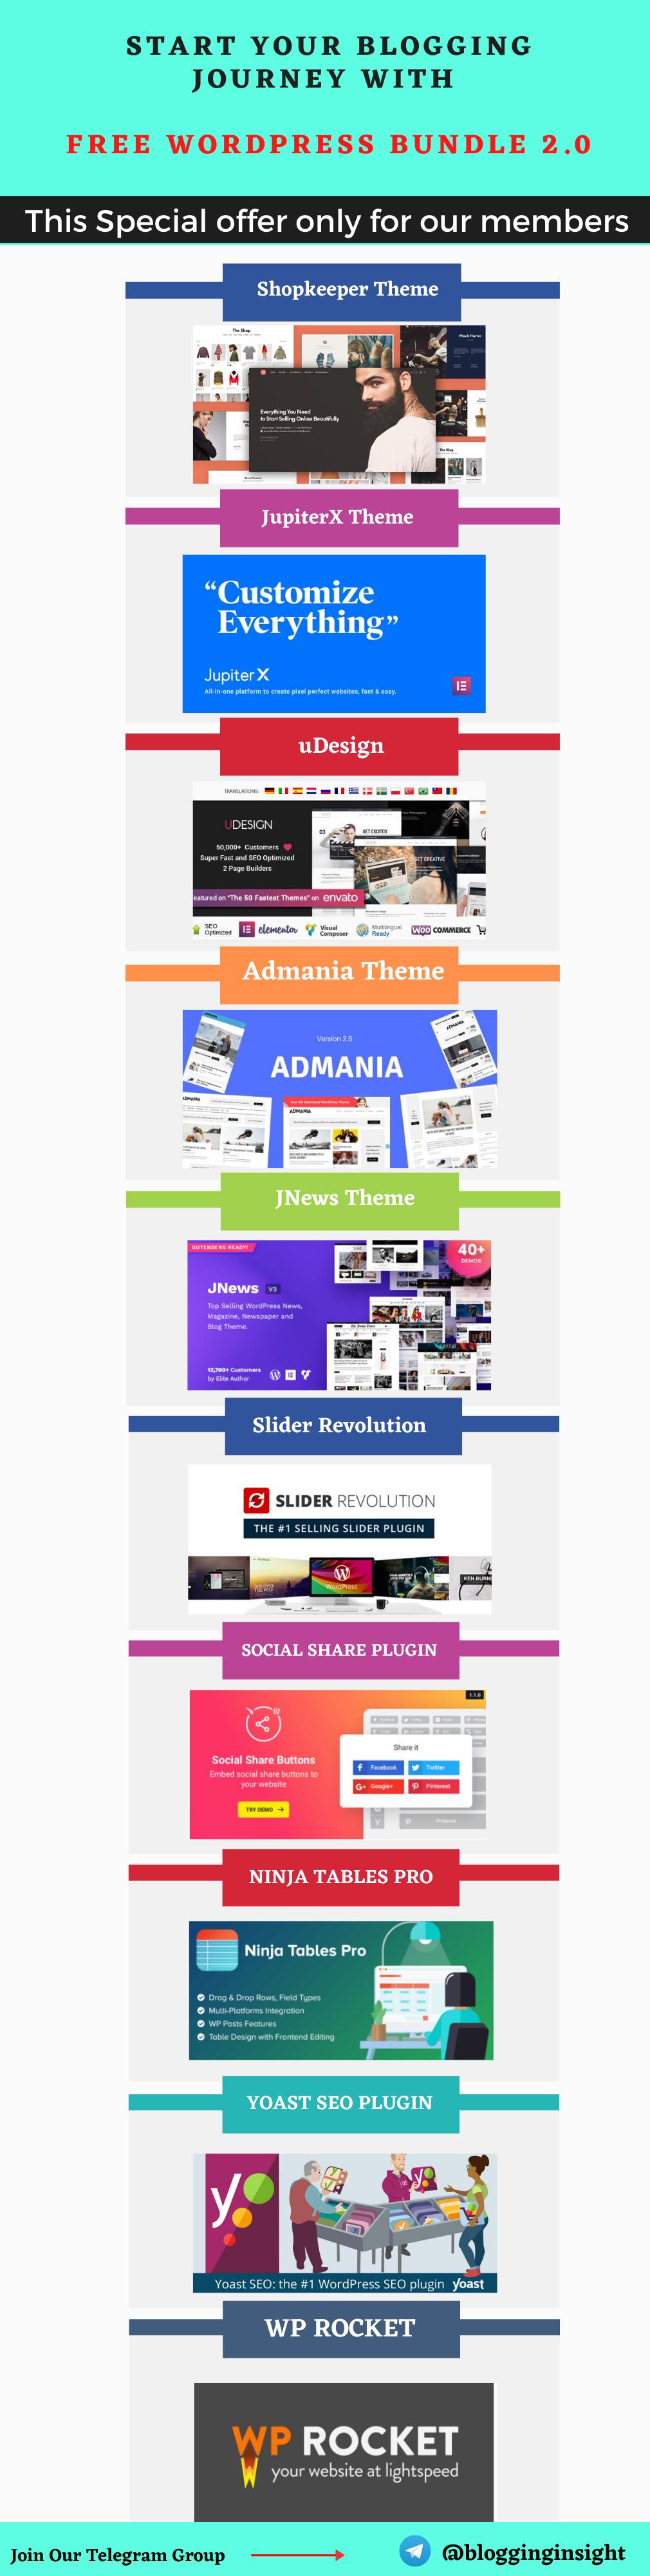 Start Your Blogging journey With Wordpress Bundle 6 - WordPress Bundle 2.0